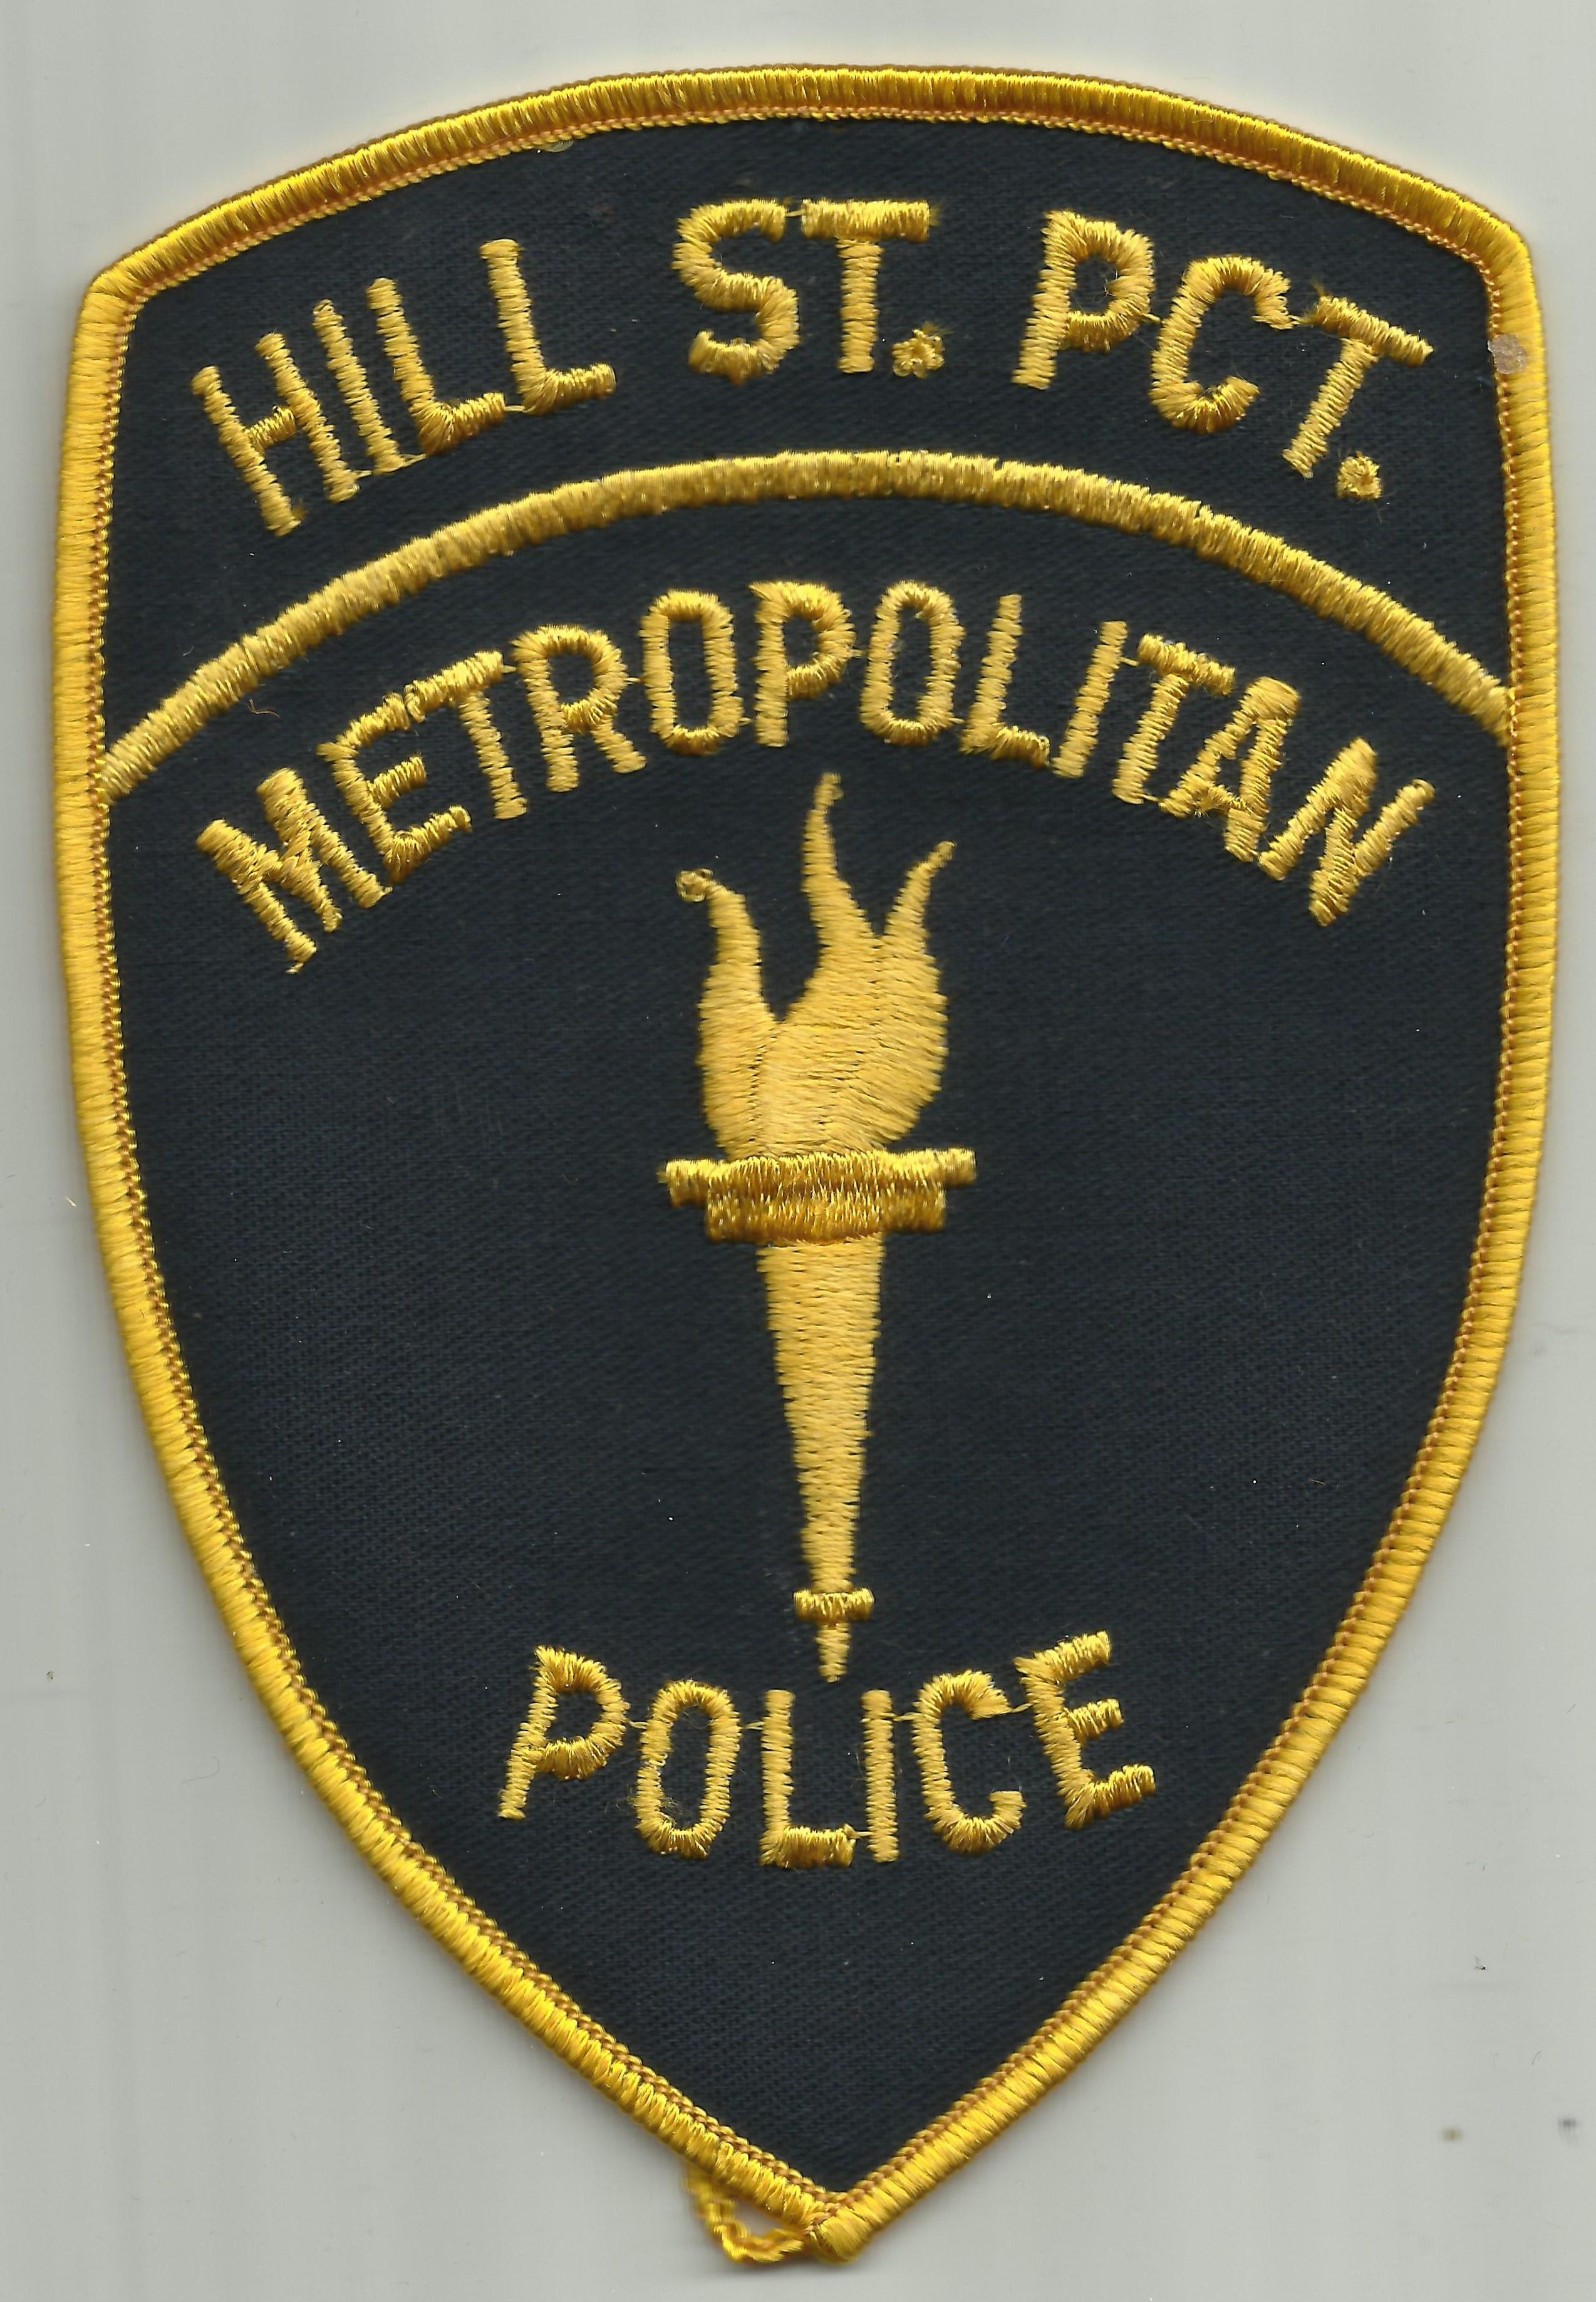 Hill Street Blues - Wikiquote